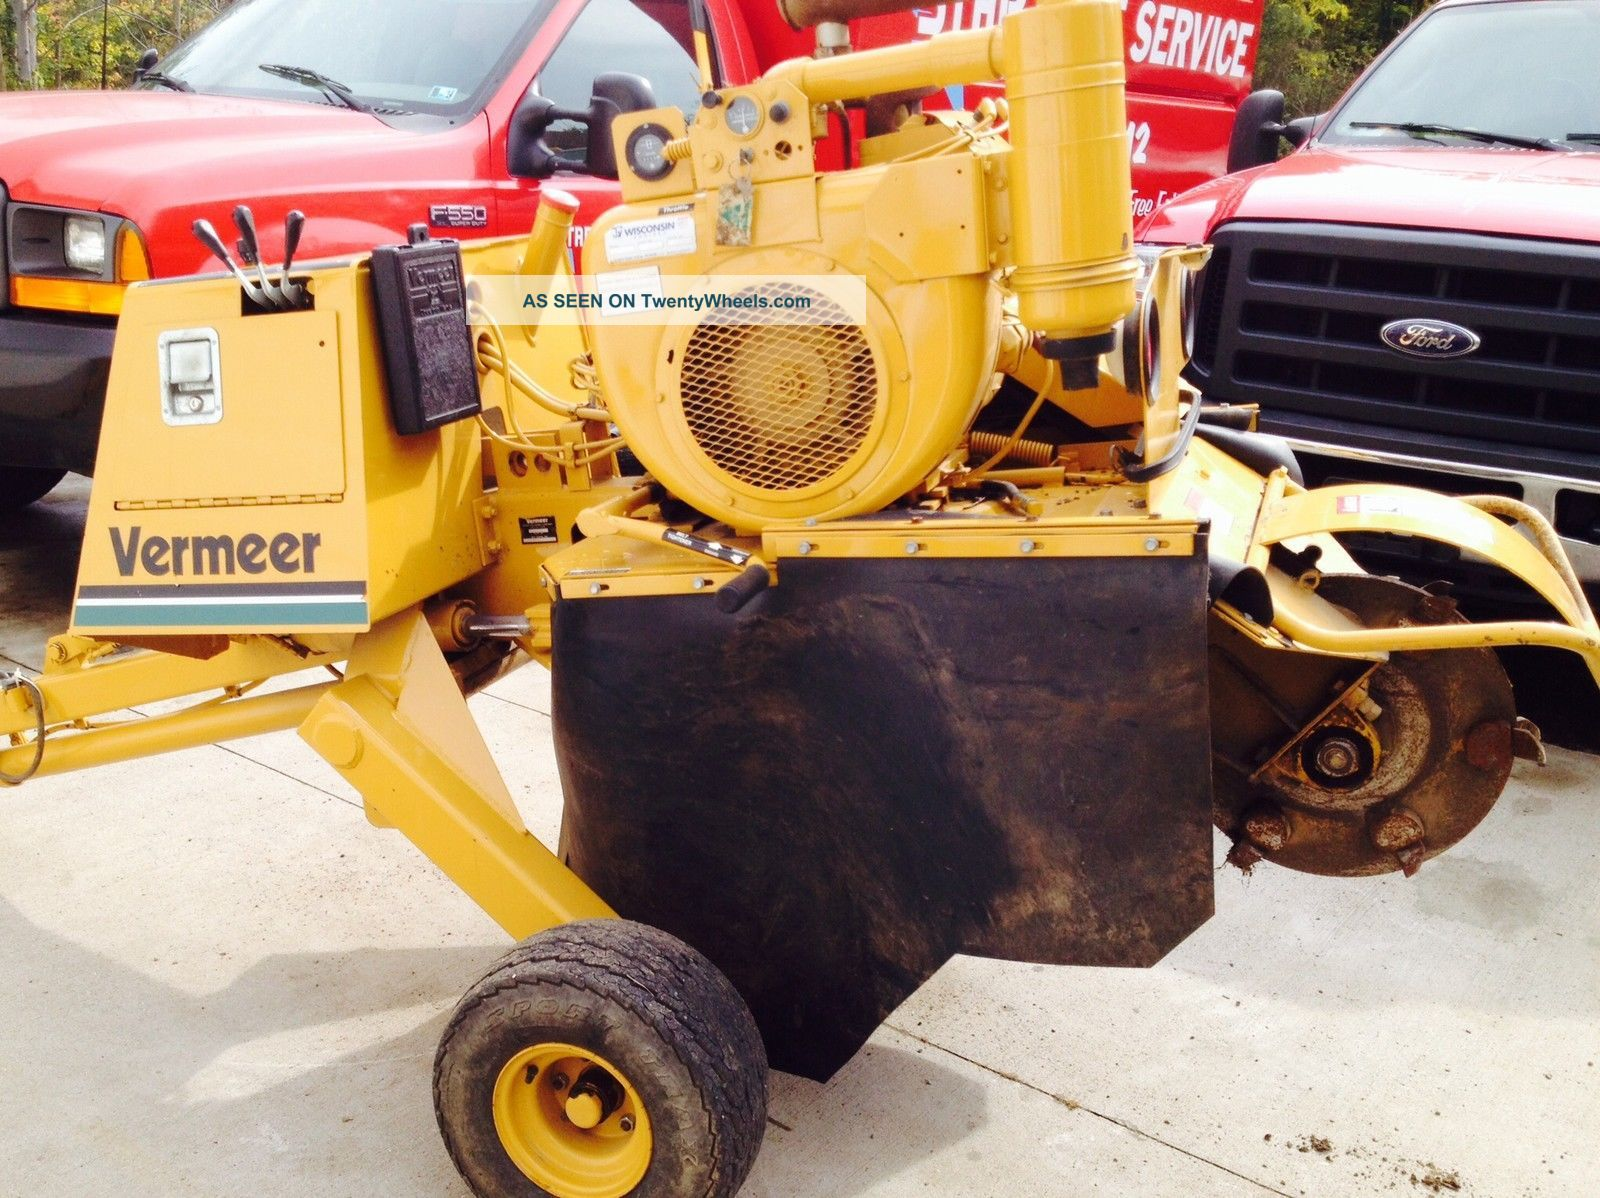 Vermeer 630b Stump Cutter/grinder Equipment photo